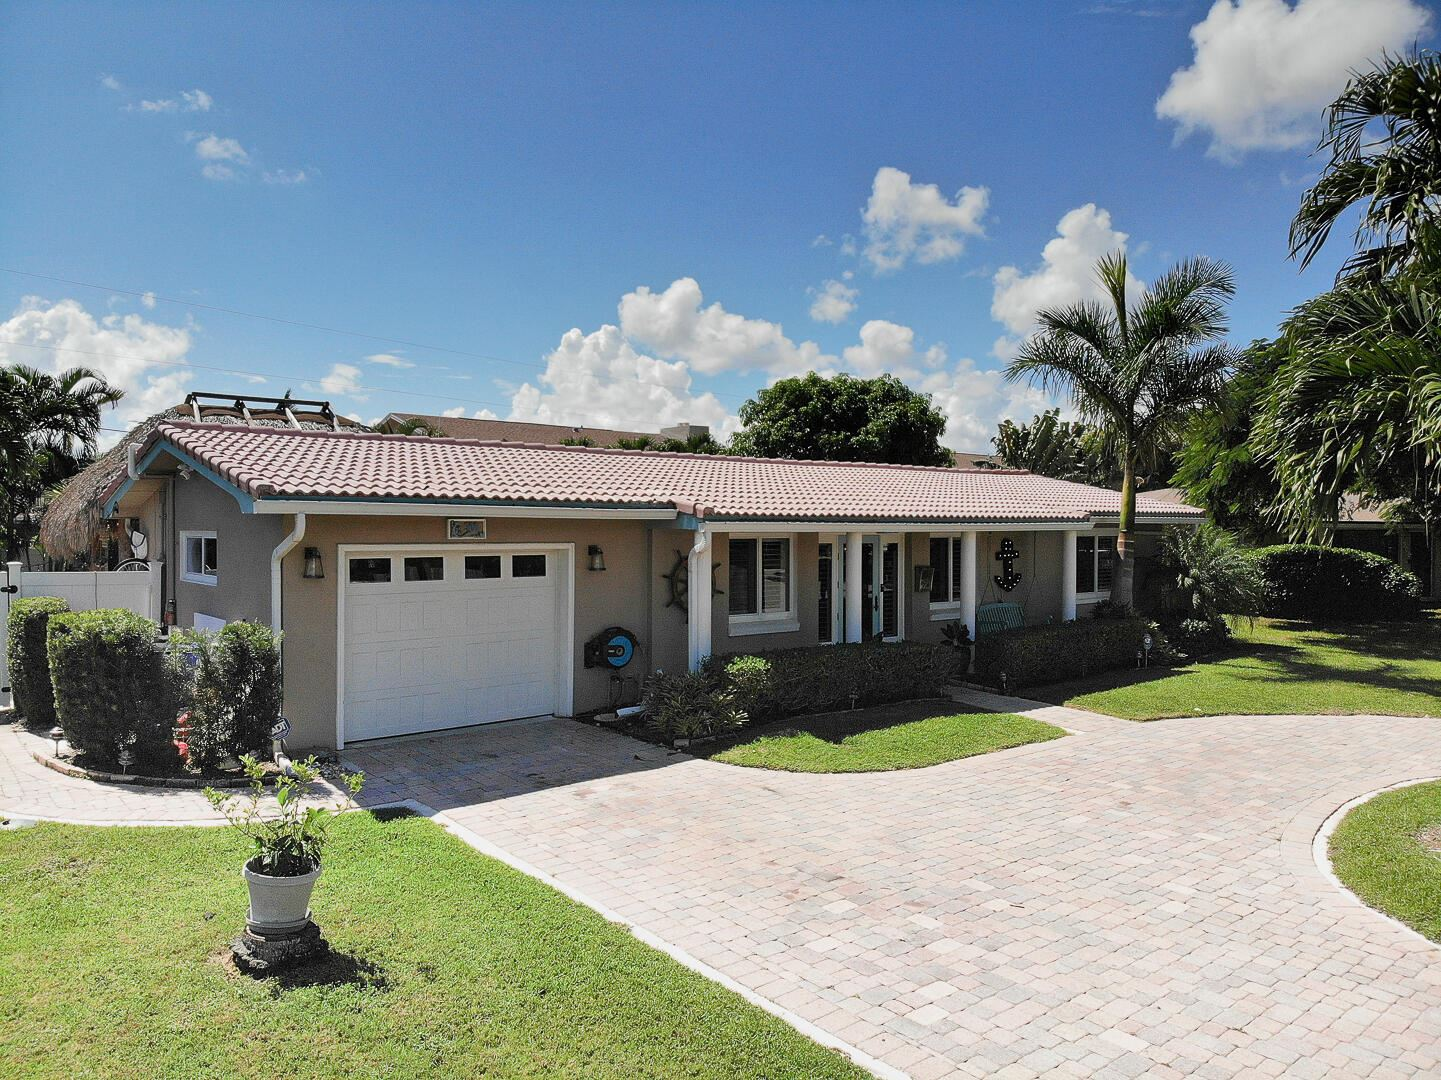 Photo of 906 SE 8th Court, Deerfield Beach, FL 33441 (MLS # RX-10751695)